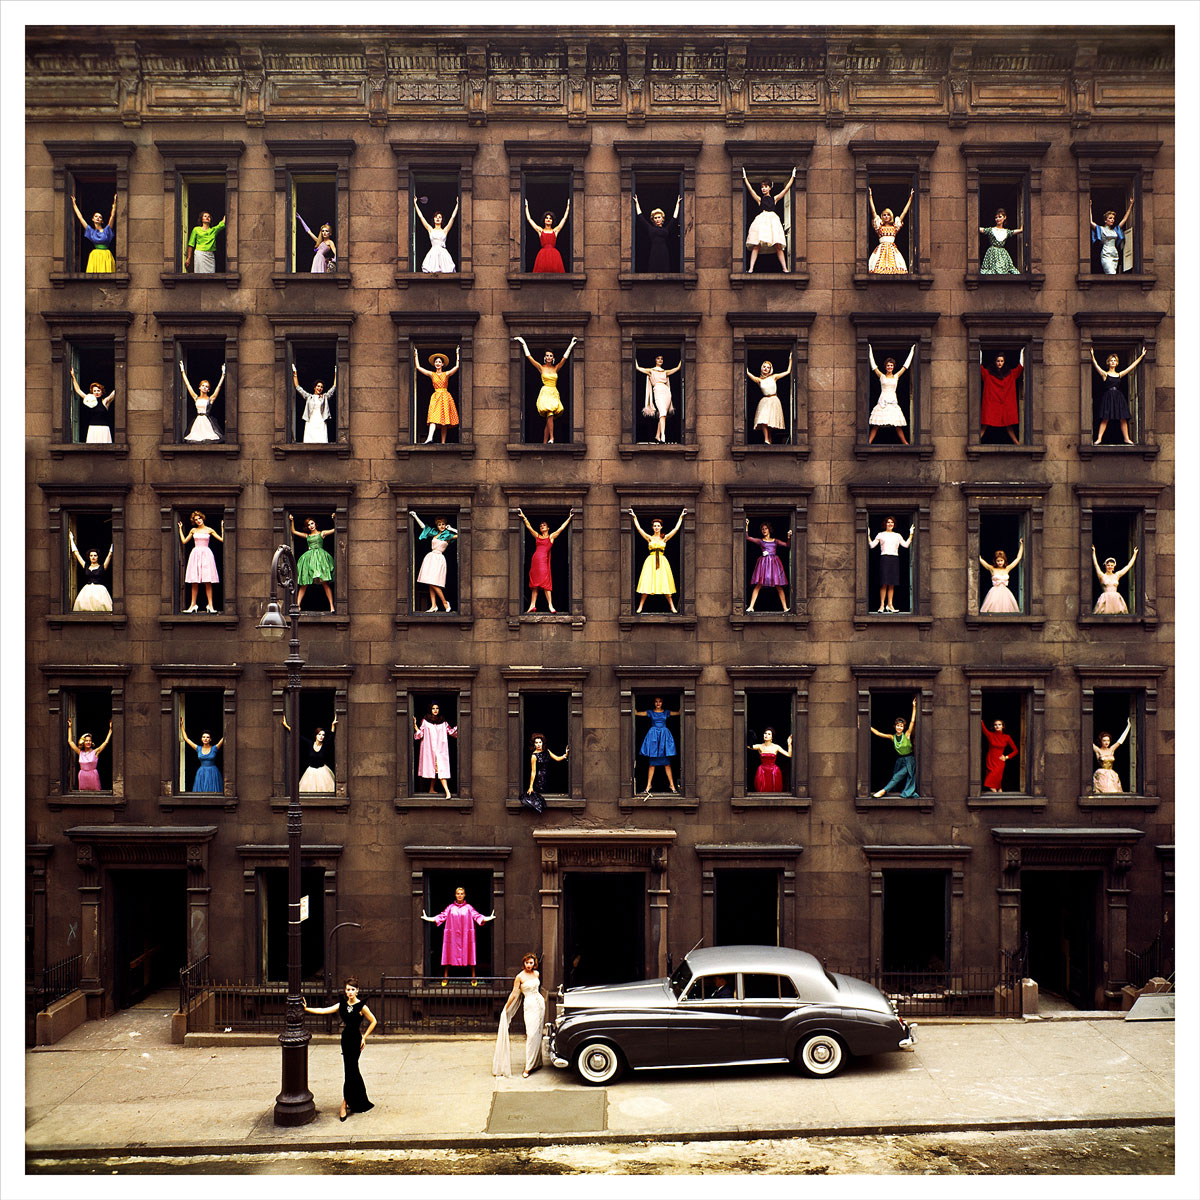 Ormond-Gigli,-Girls-in-the-Windows,-New-York,-1960